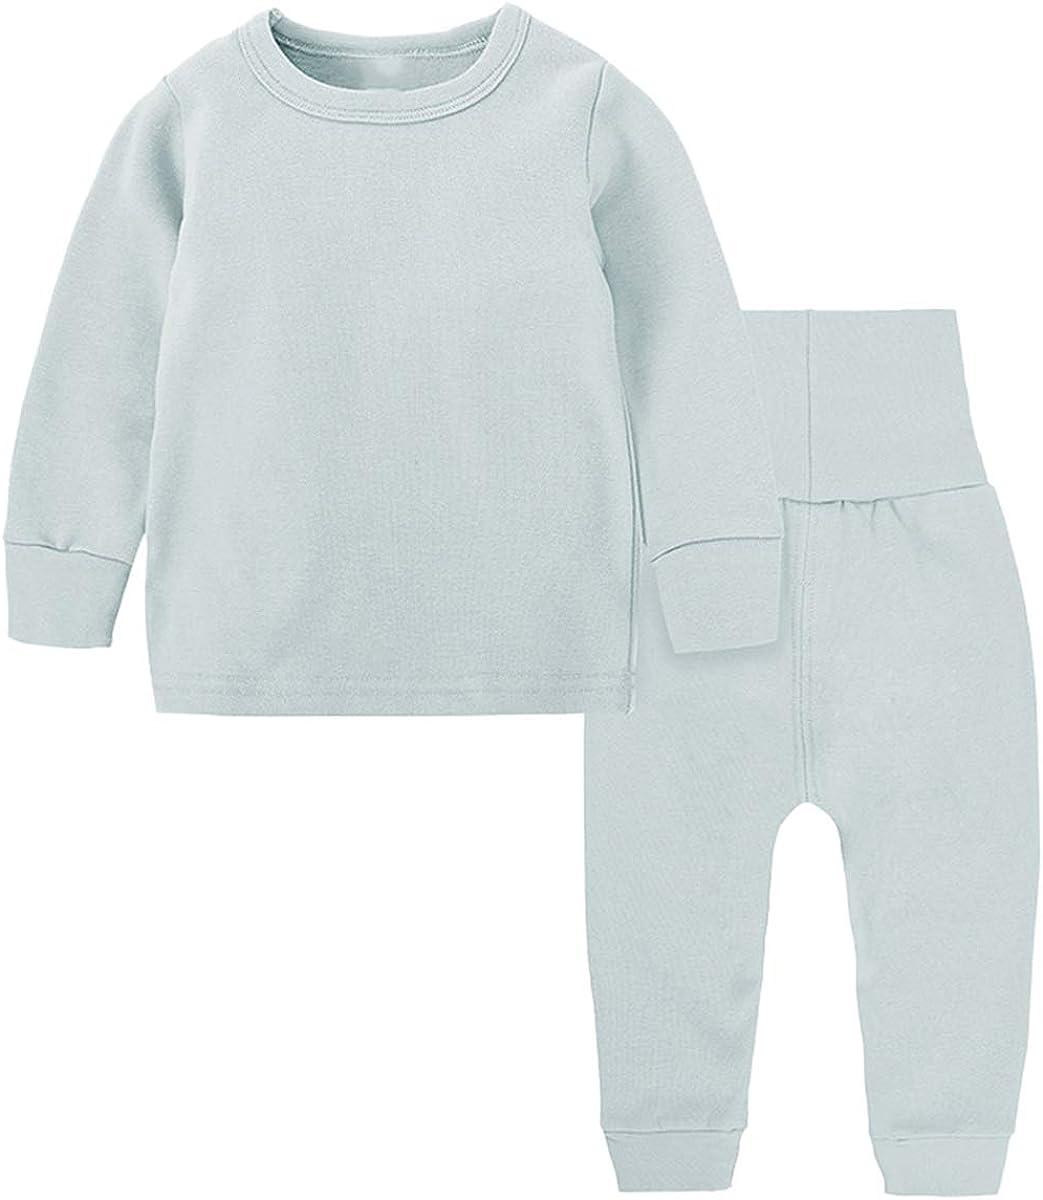 Toddler Boy's Thermal Underwear Set Base Layer Top & Bottom Set, Blue, 4-5T = Tag 130